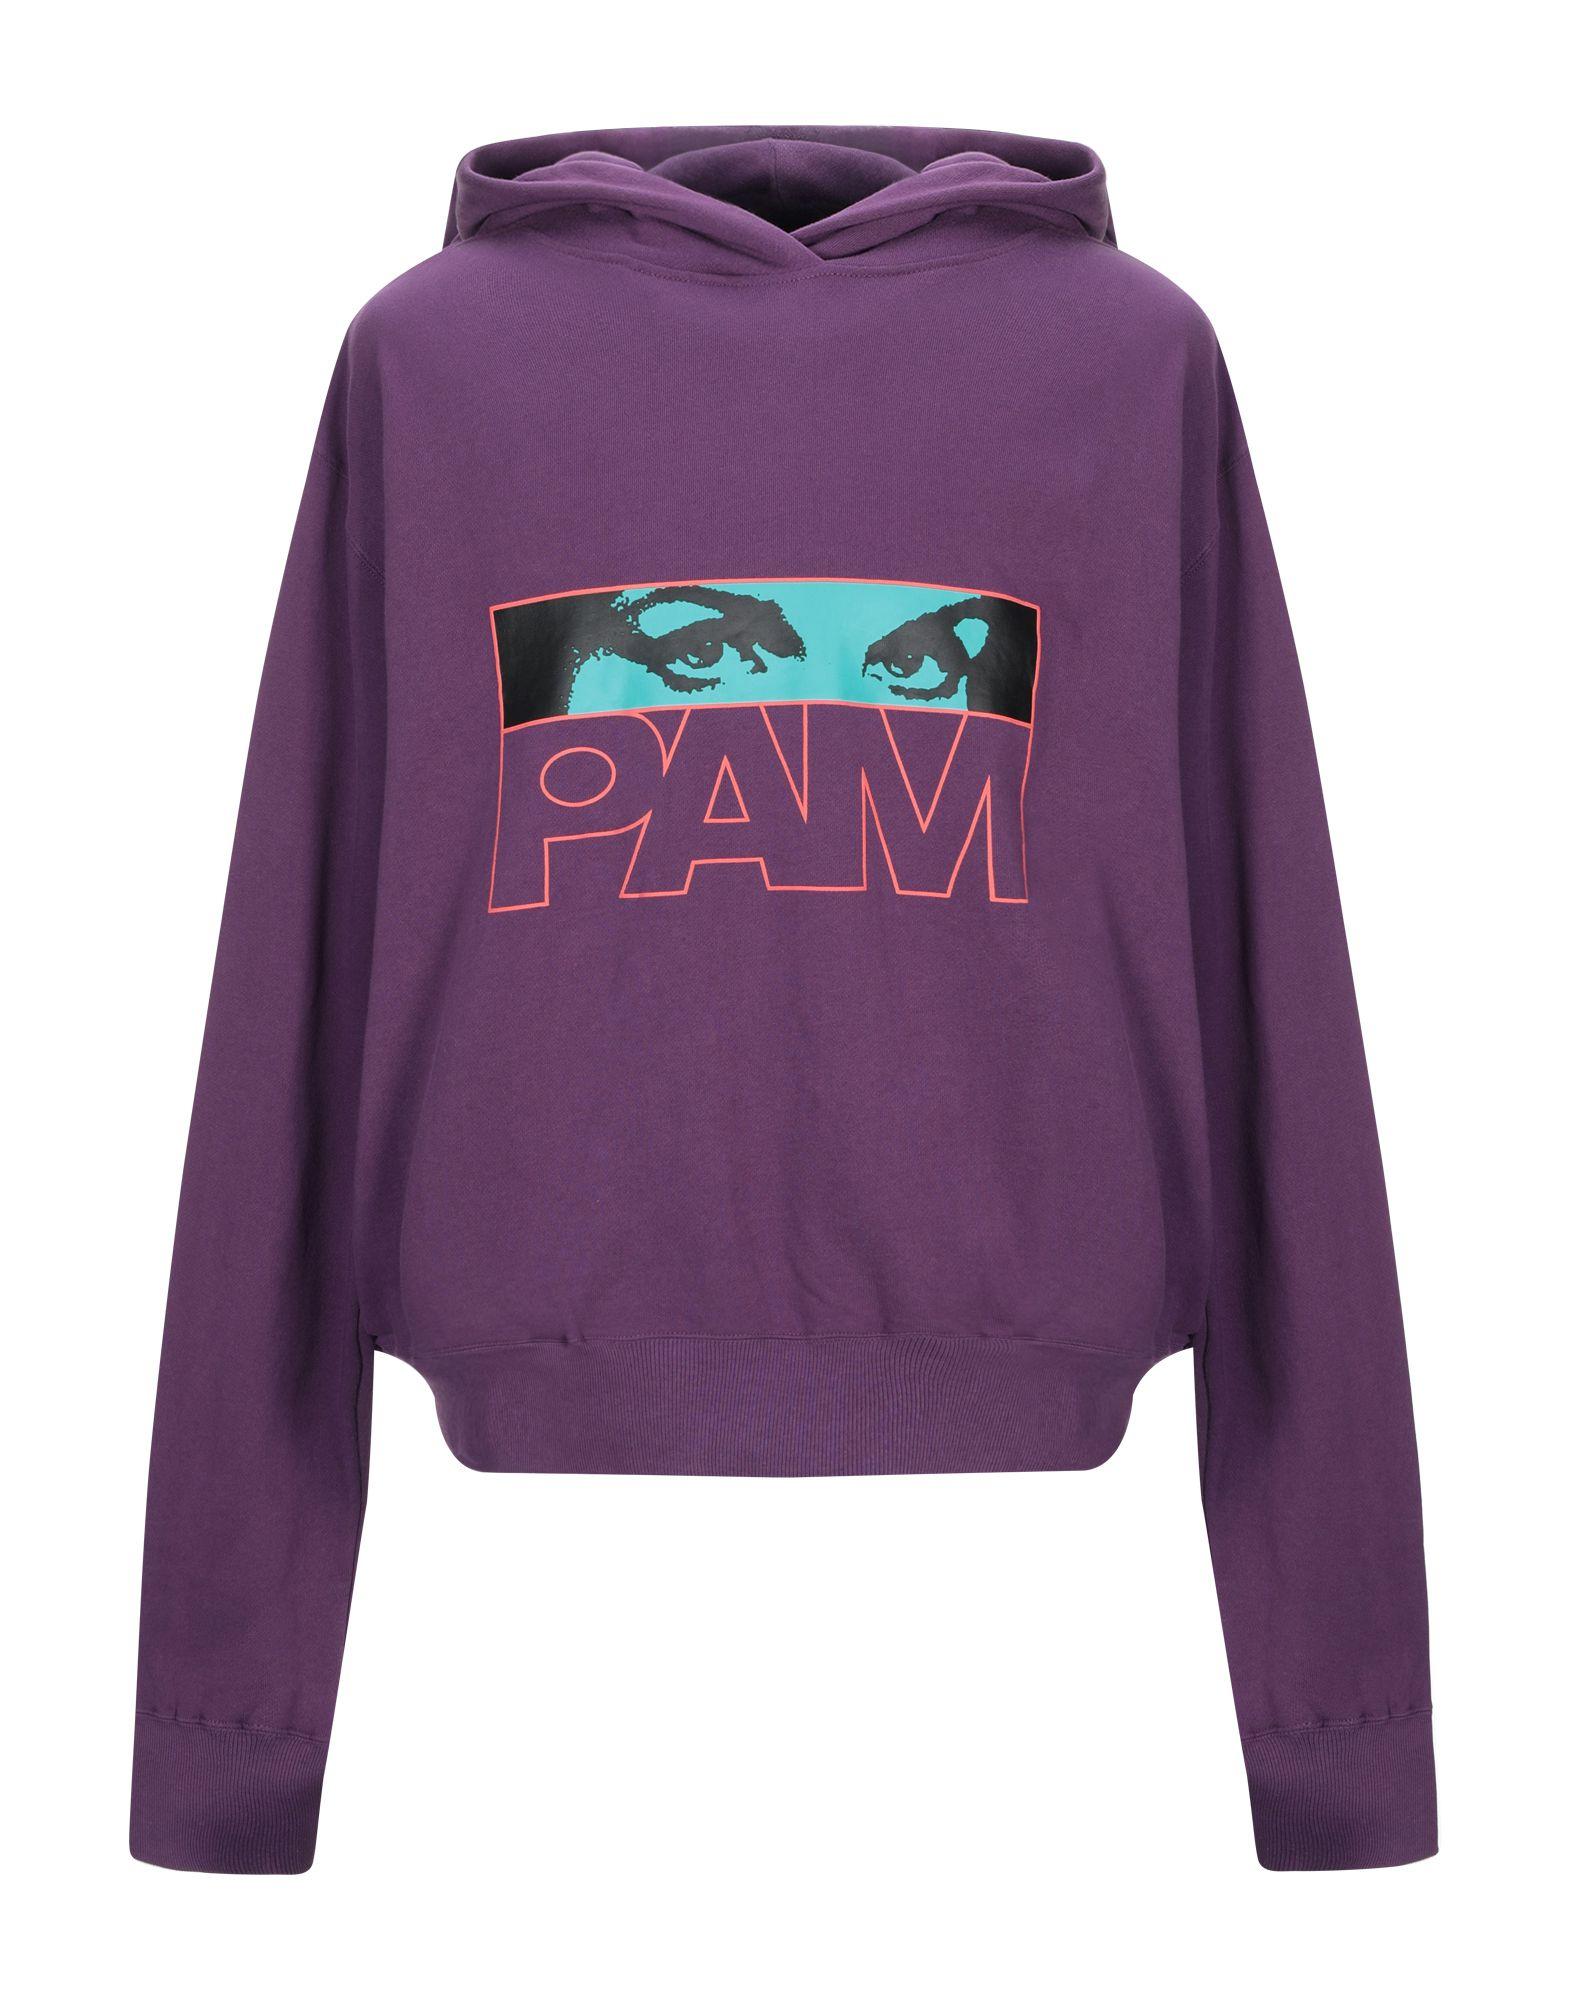 PERKS AND MINI   P.A.M. PERKS AND MINI Sweatshirts 12332273   Goxip